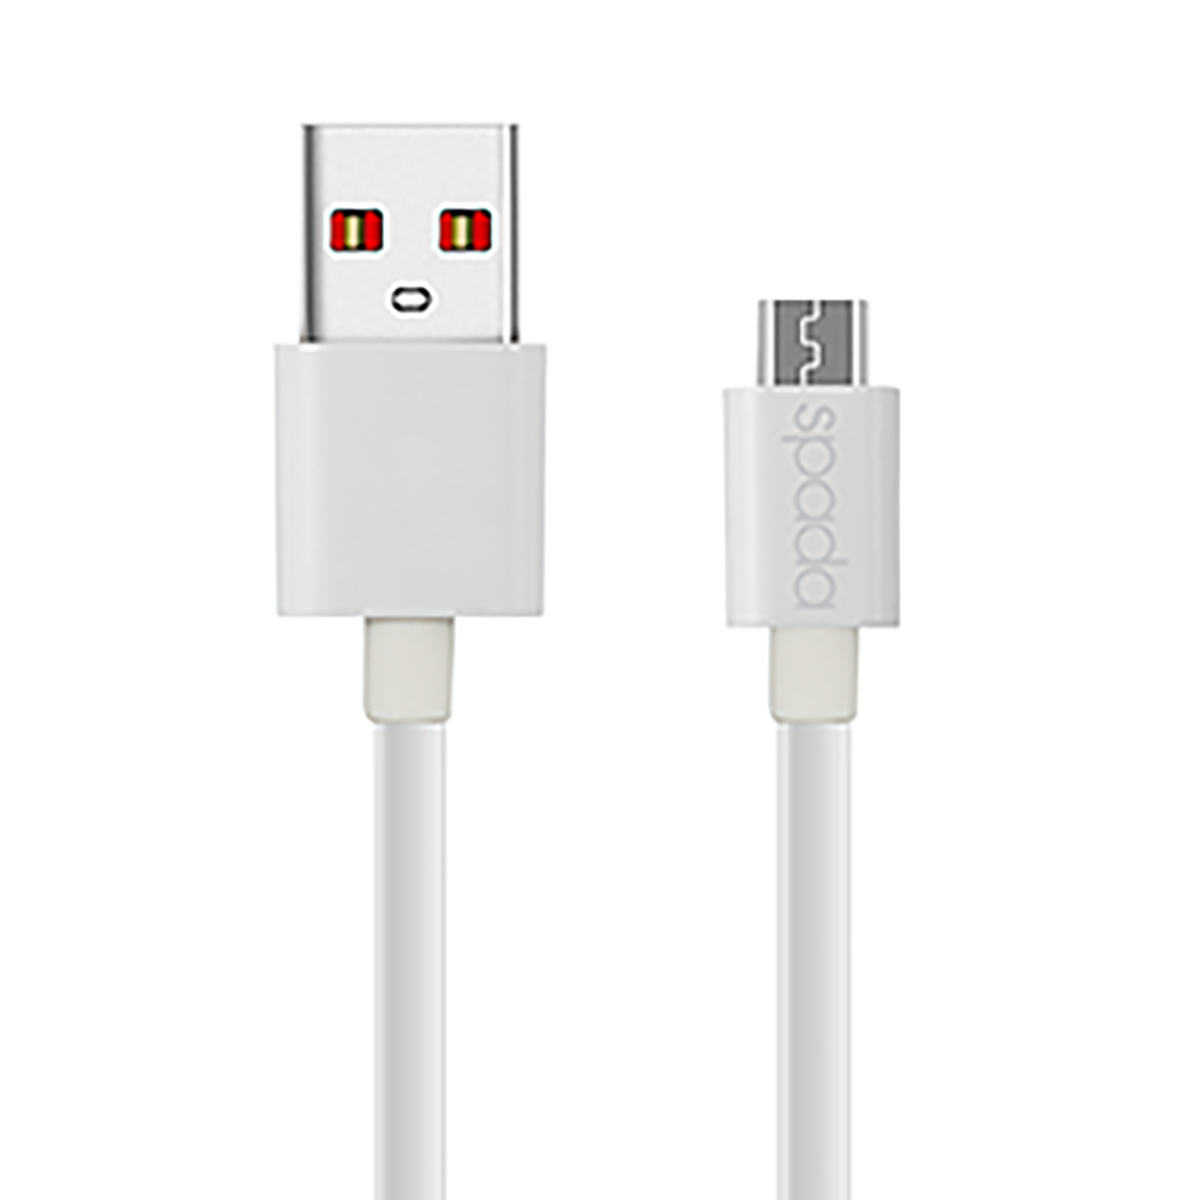 spada STC-A515A 1800 Mah Mikro Usb kablolu ev şarjı